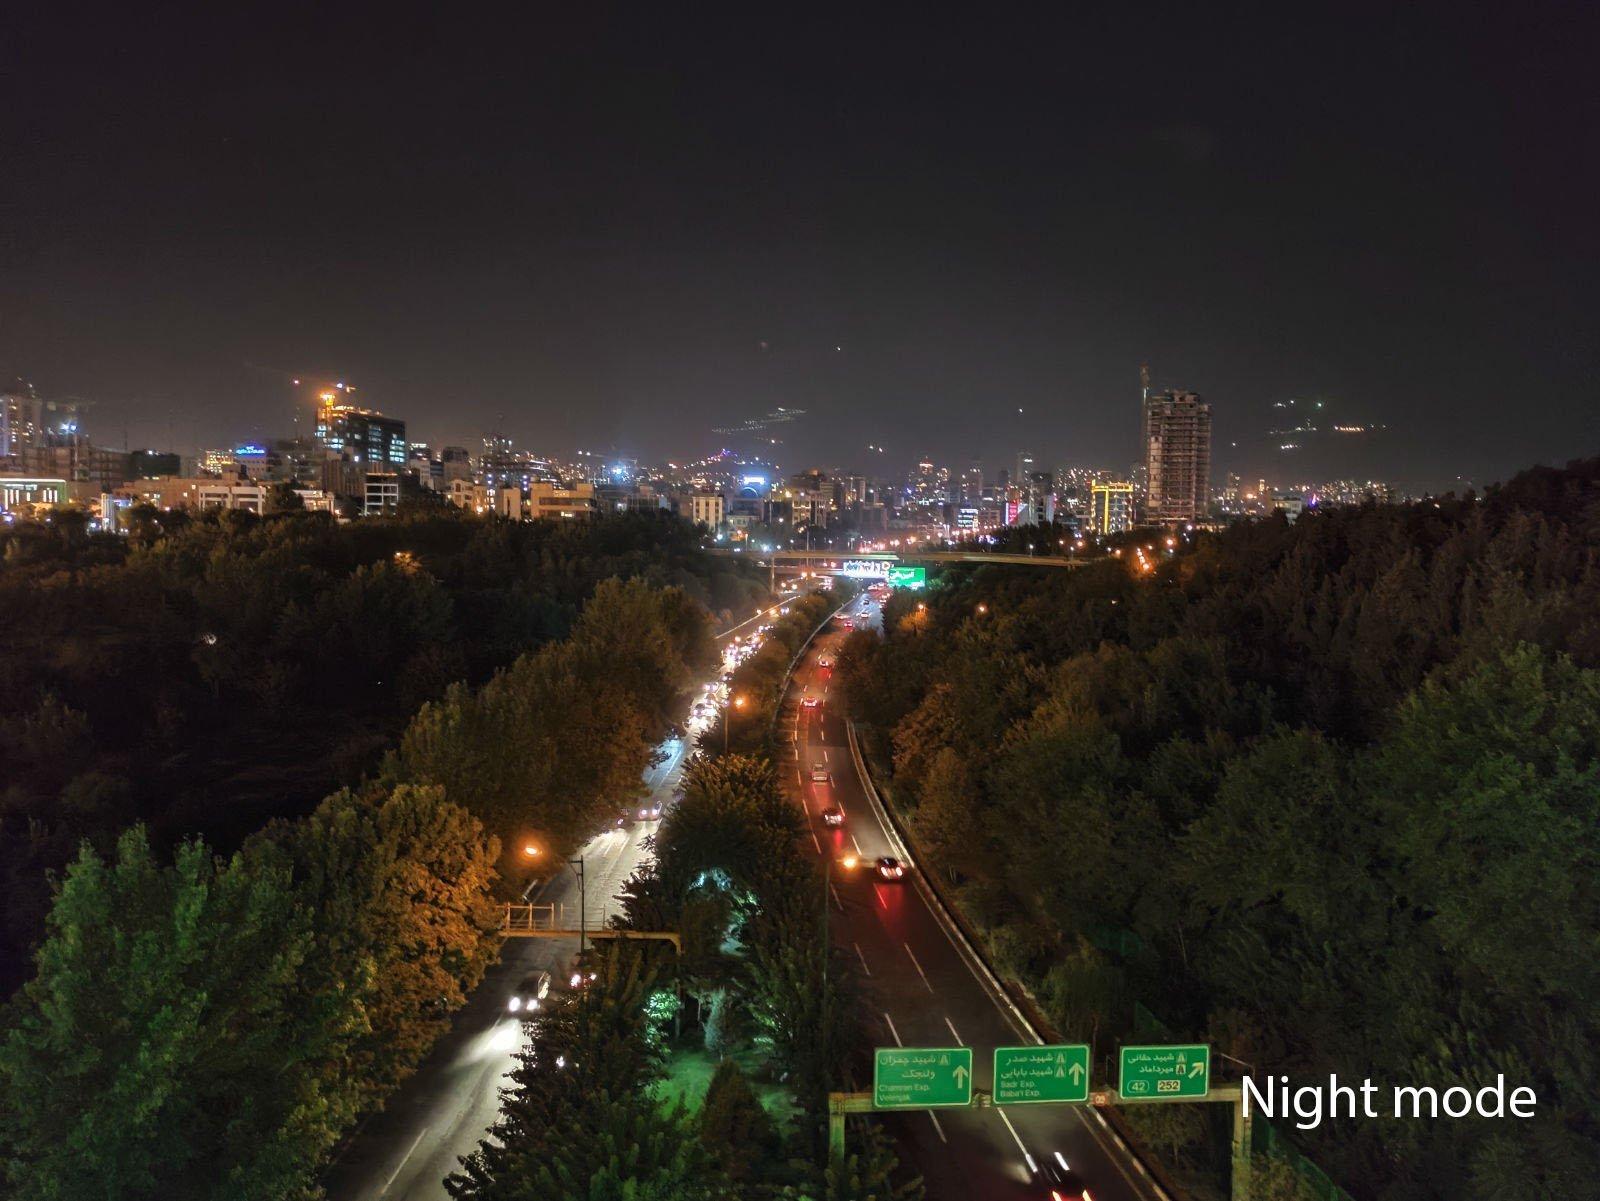 PocoF2Pro MainCam NightMode 1 بررسی شیائومی پوکو اف ۲ پرو ؛ کابوس پرچمداران ۱۰۰۰ دلاری اخبار IT